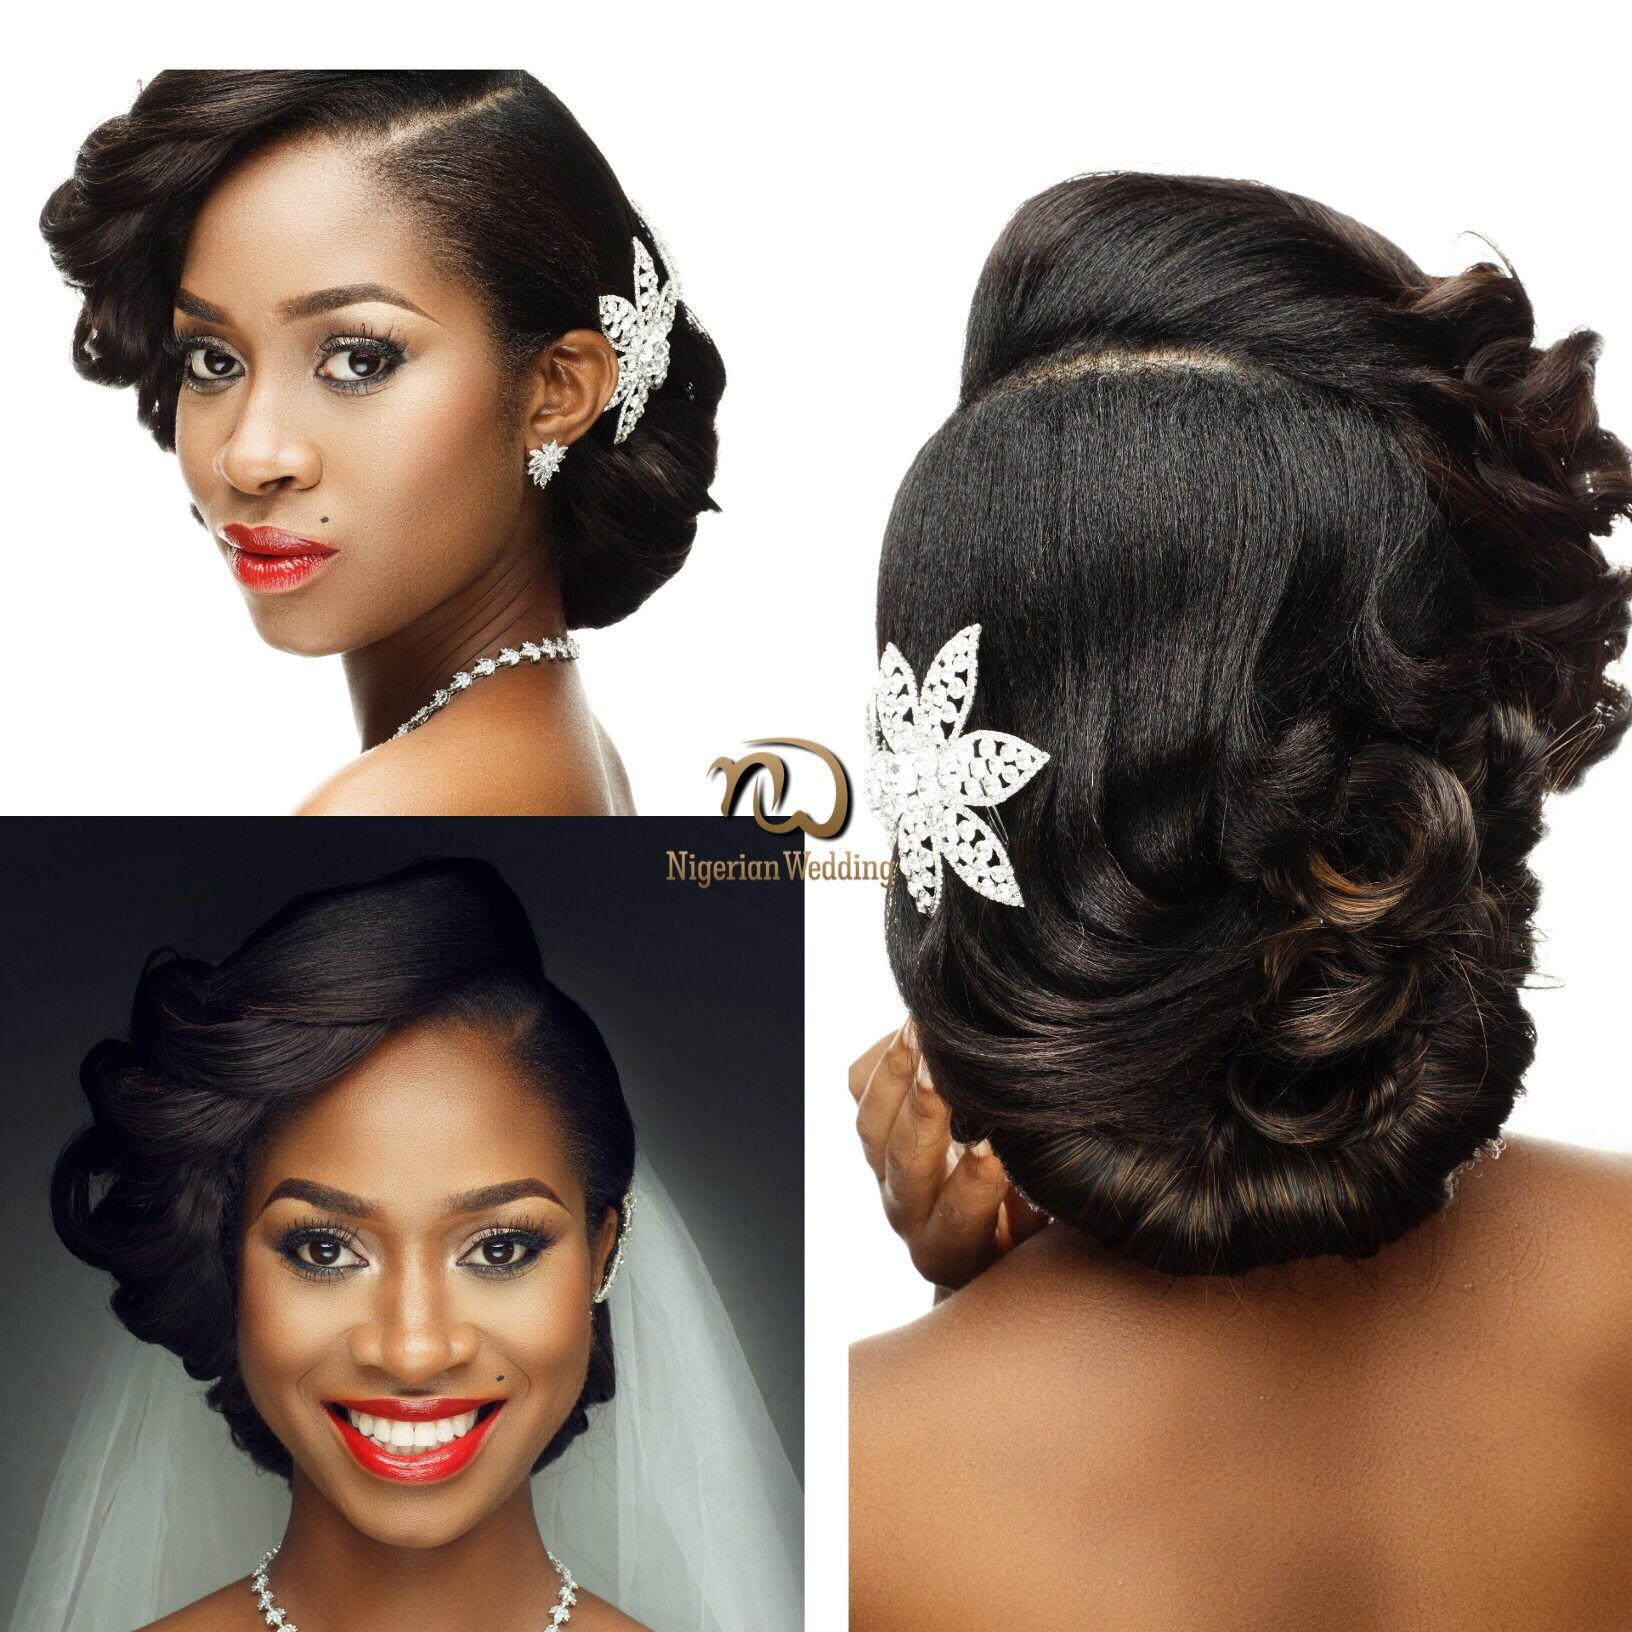 Elegant Hairstyles For Nigerian Brides: Wedding Hairstyles For Nigeria